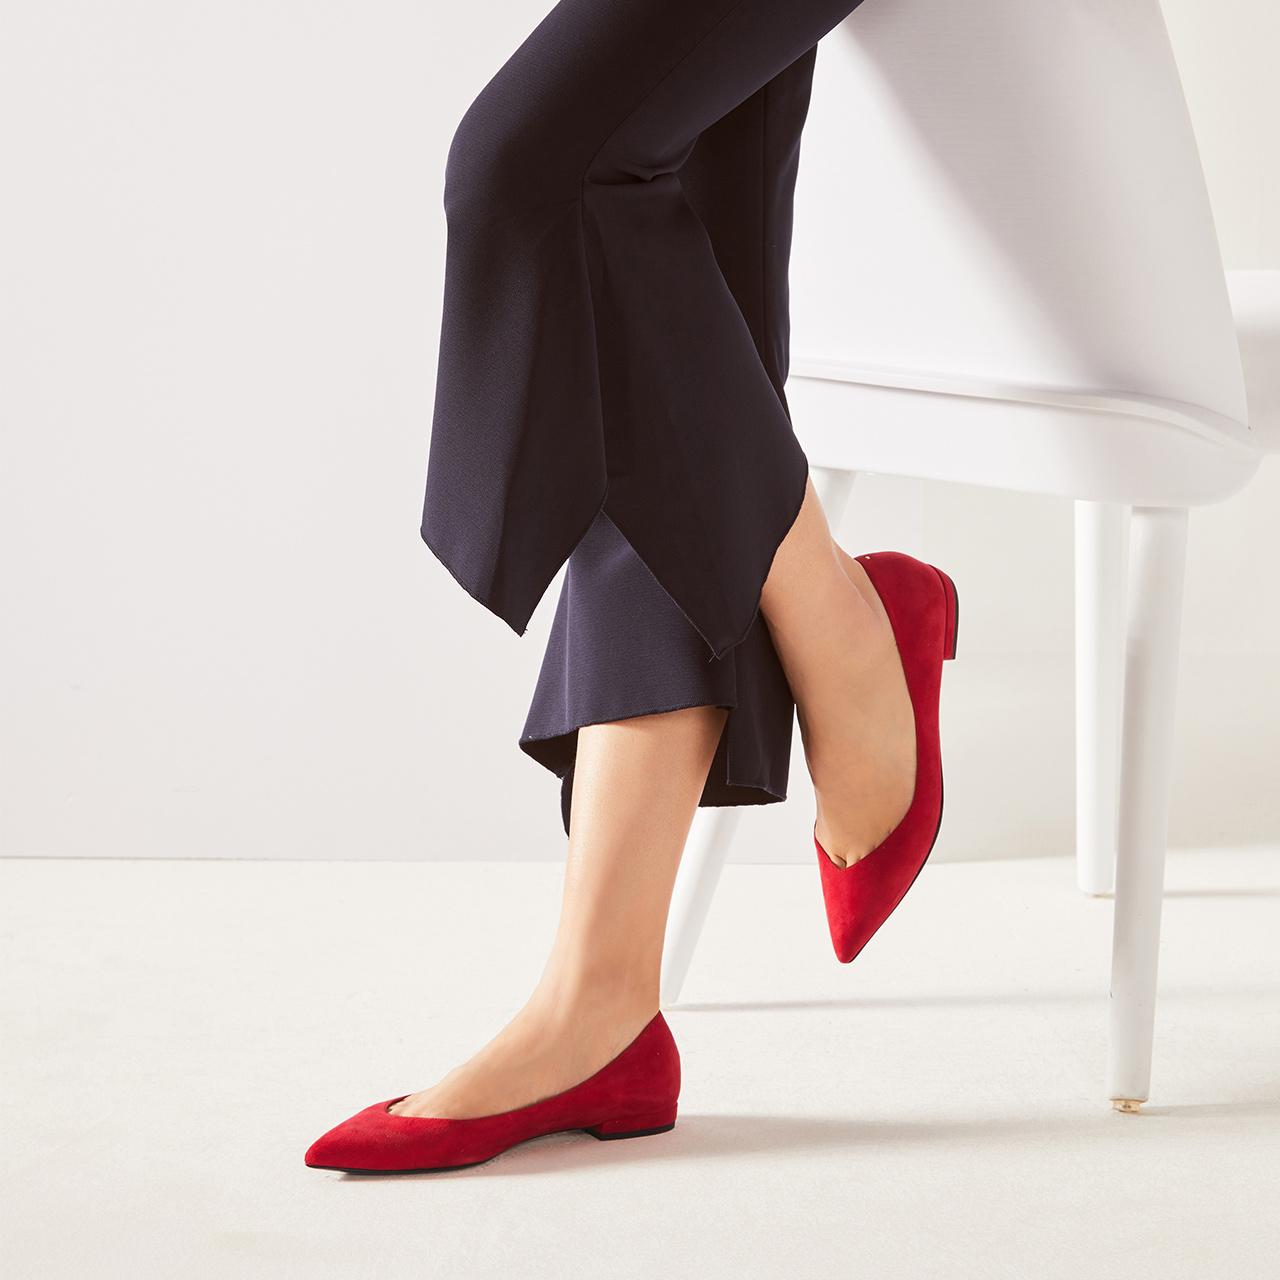 STELLA LUNA秋季尖頭平跟女士單鞋 SH334C24105